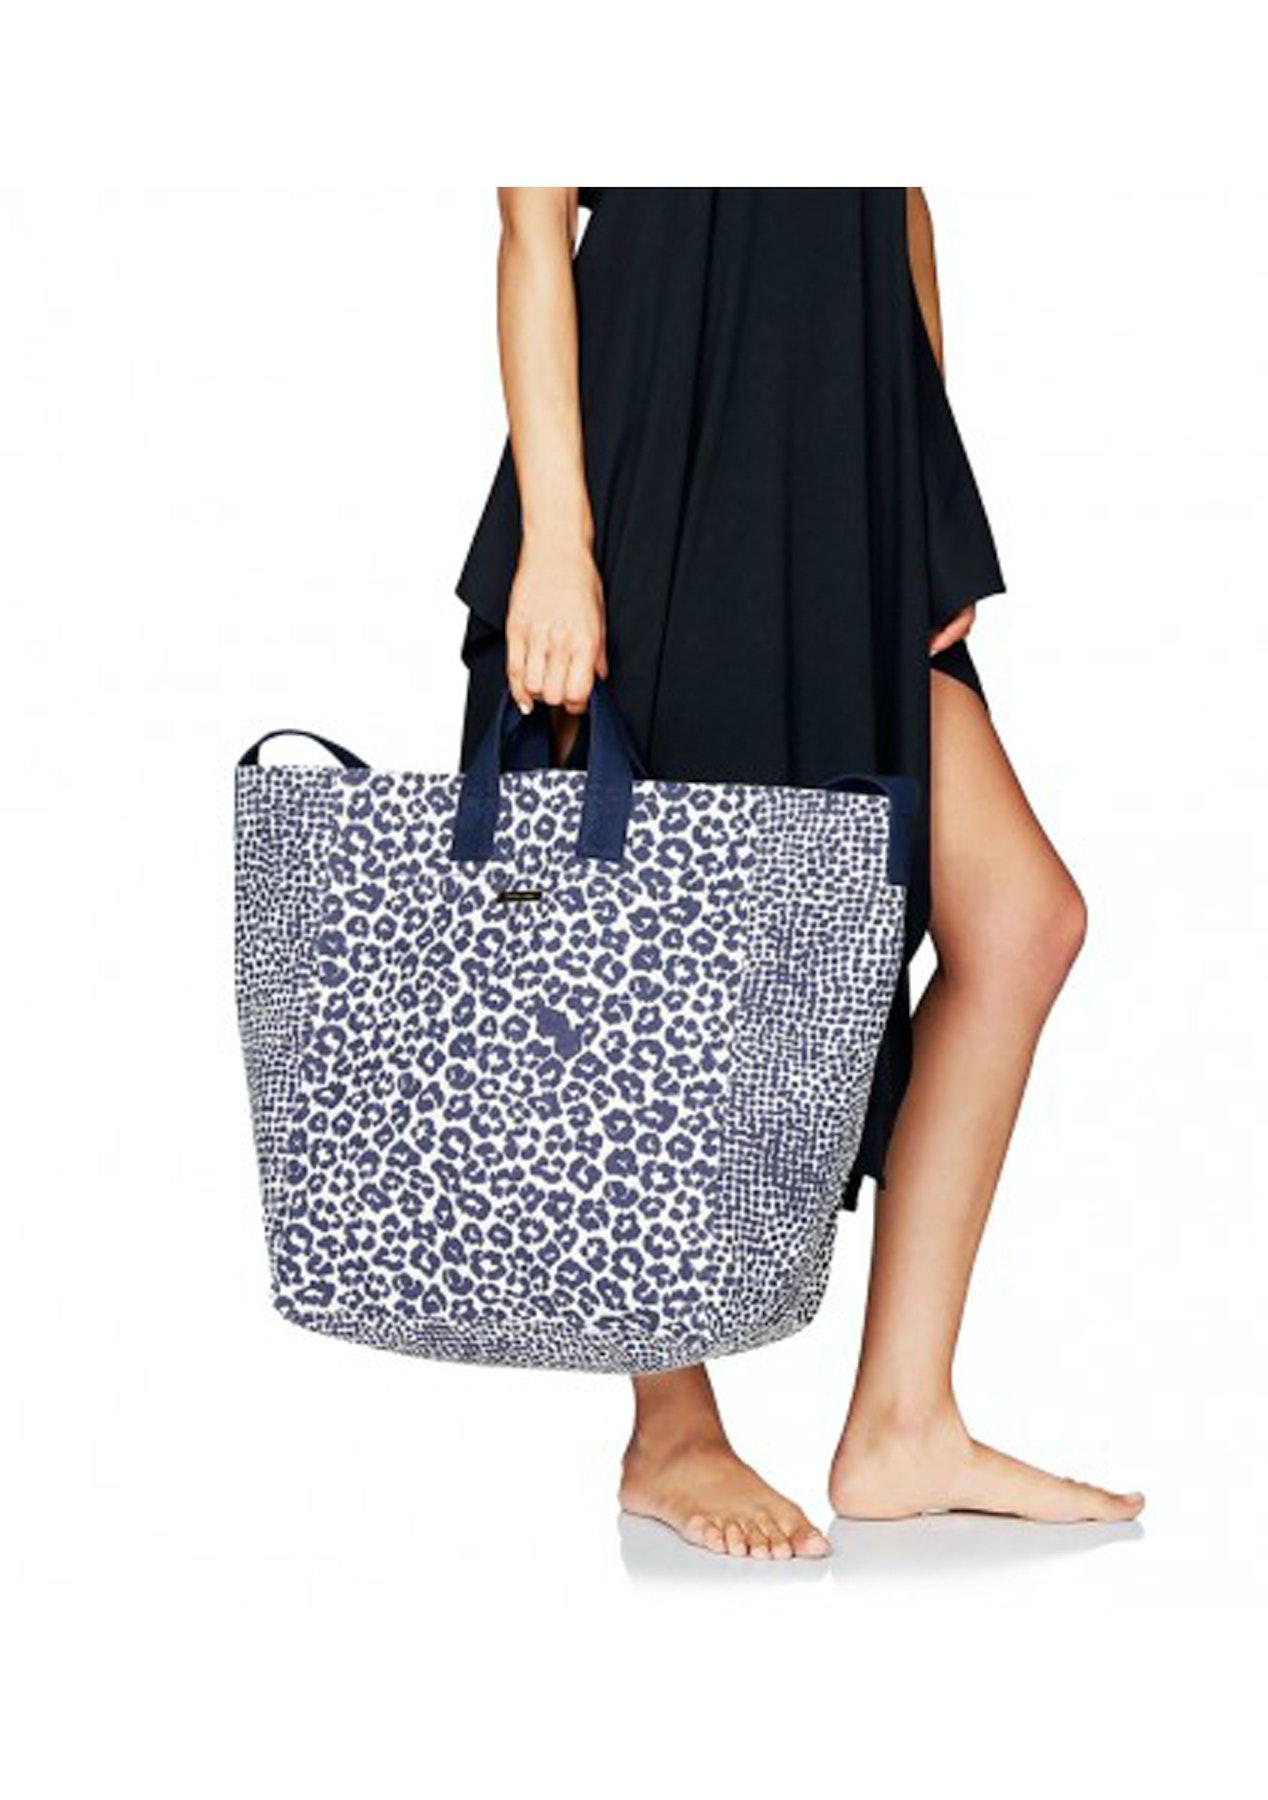 Stella Mccartney Beach Bag Midnight Blue Leopard Giraffe Print Heidi Klum Swim Onceit